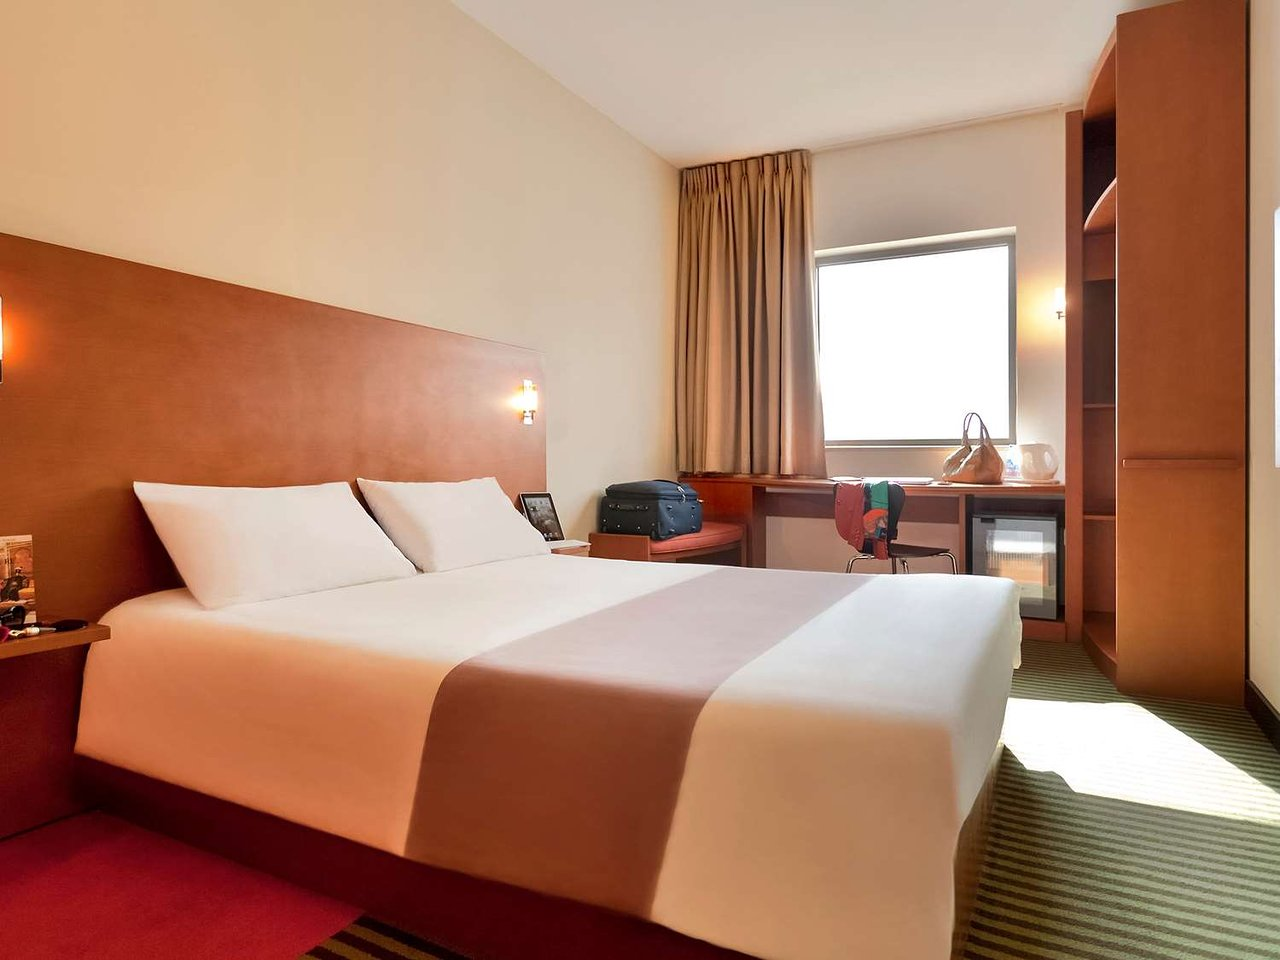 the 10 best 3 star hotels in amman of 2019 with prices tripadvisor rh tripadvisor com